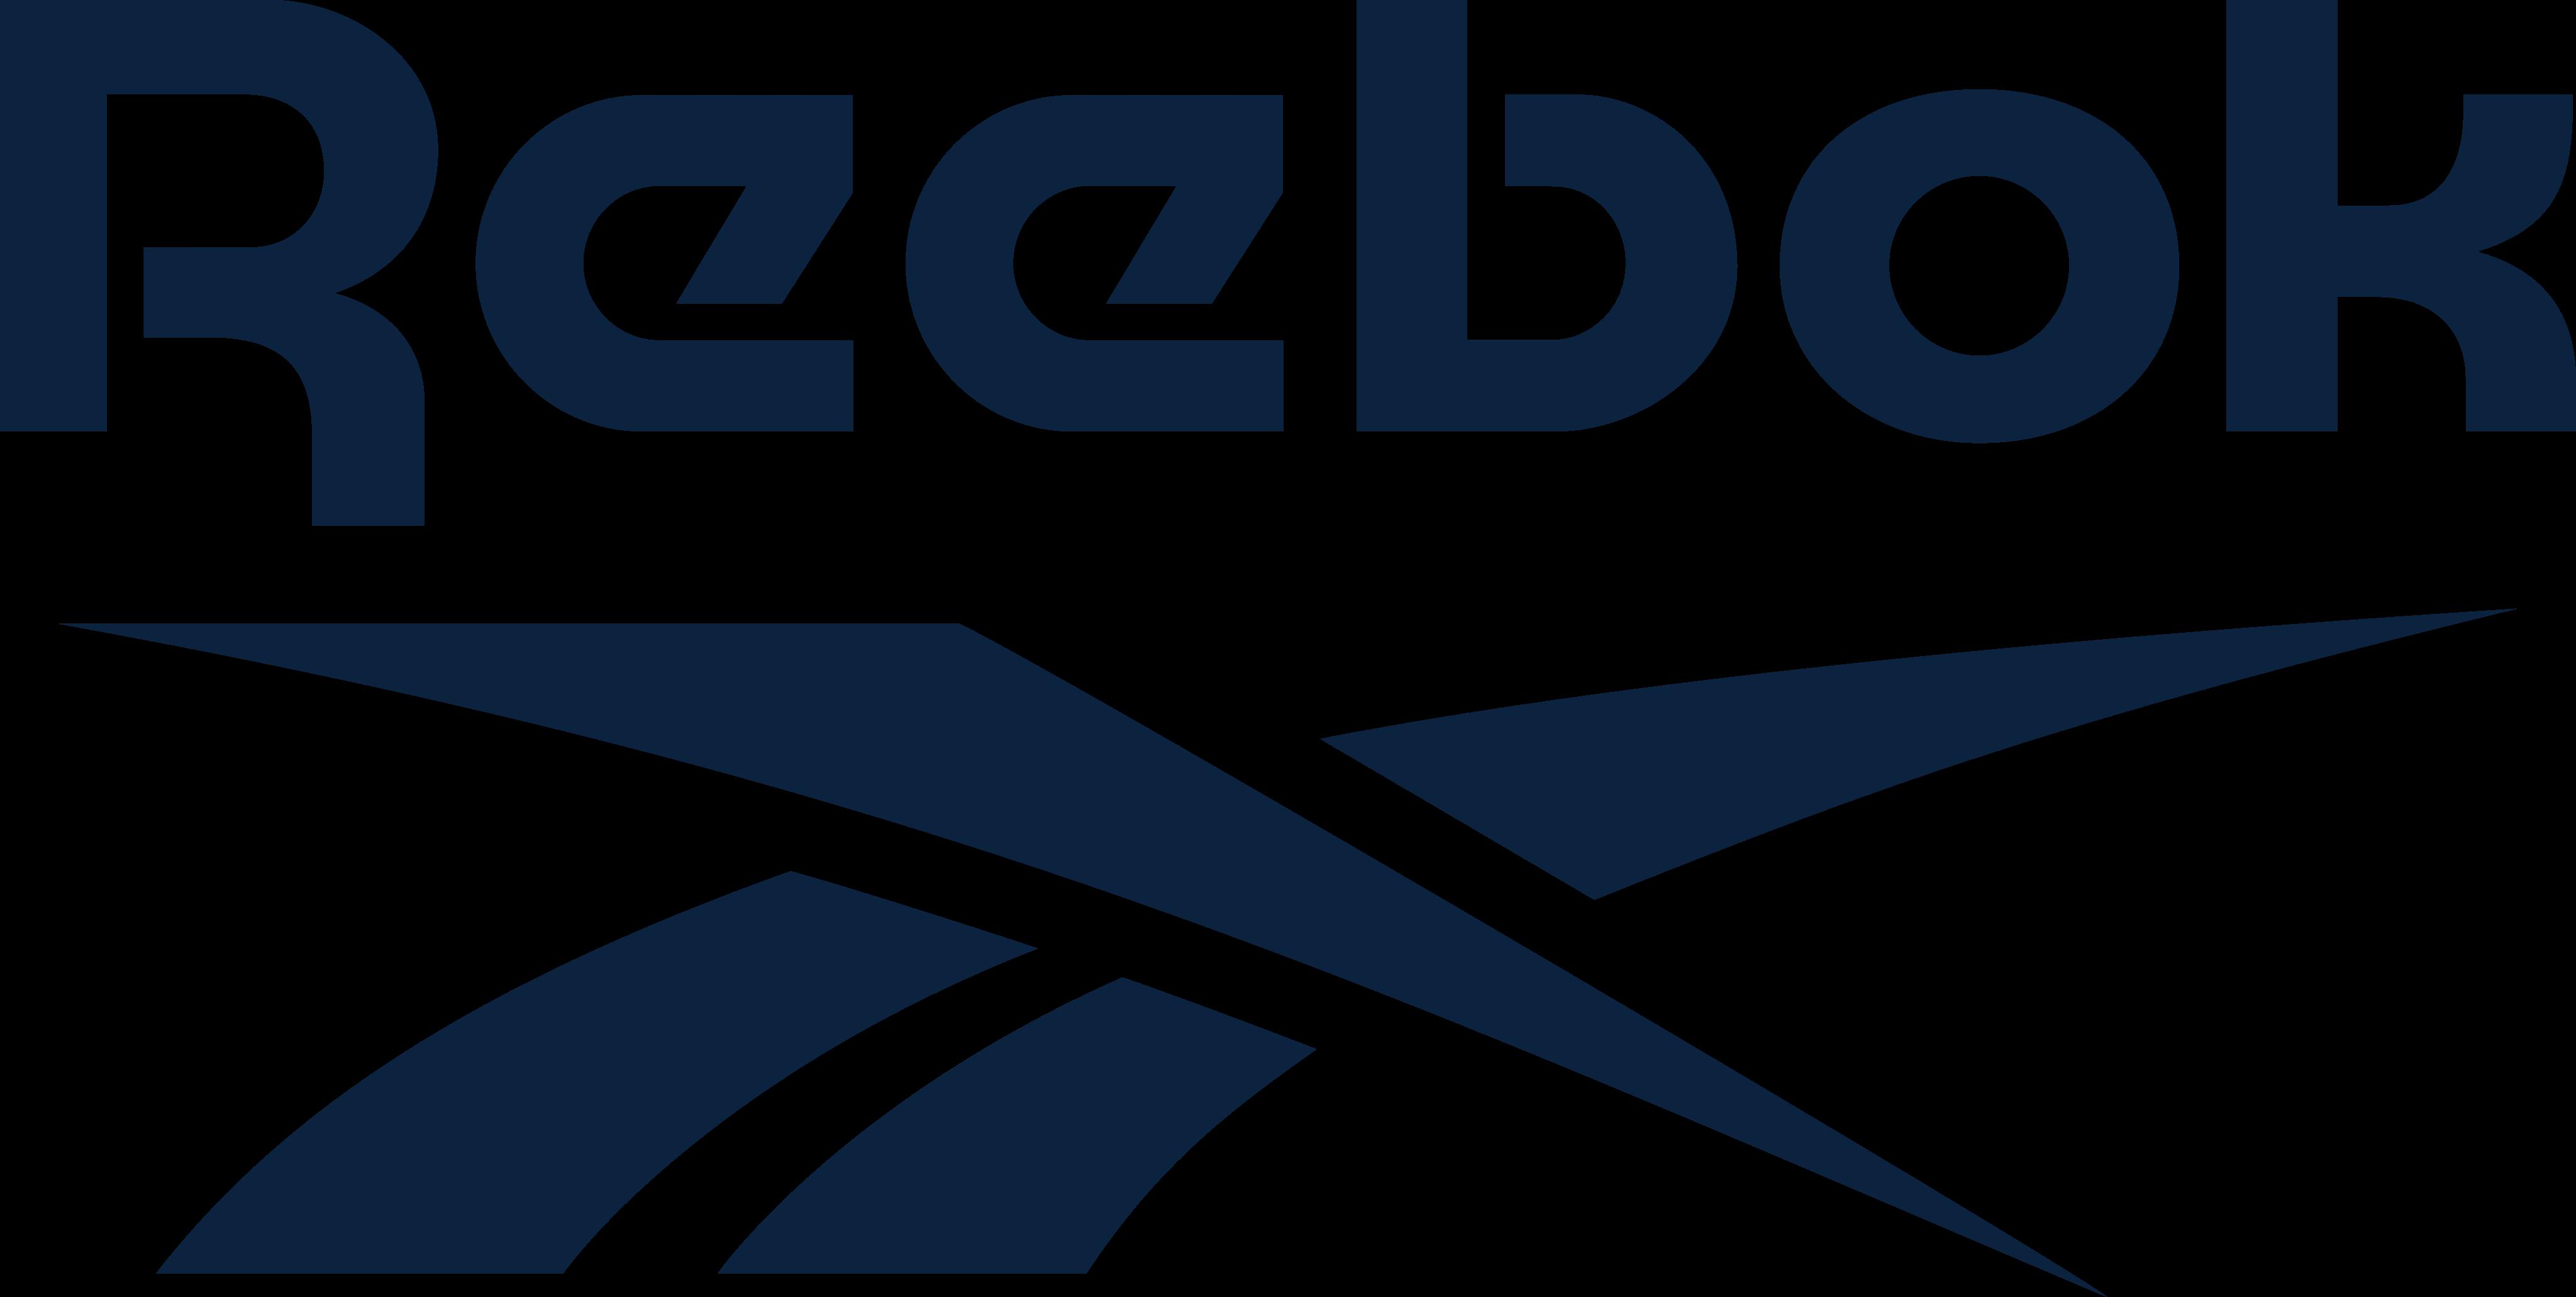 reebok logo 3 - Reebok Logo